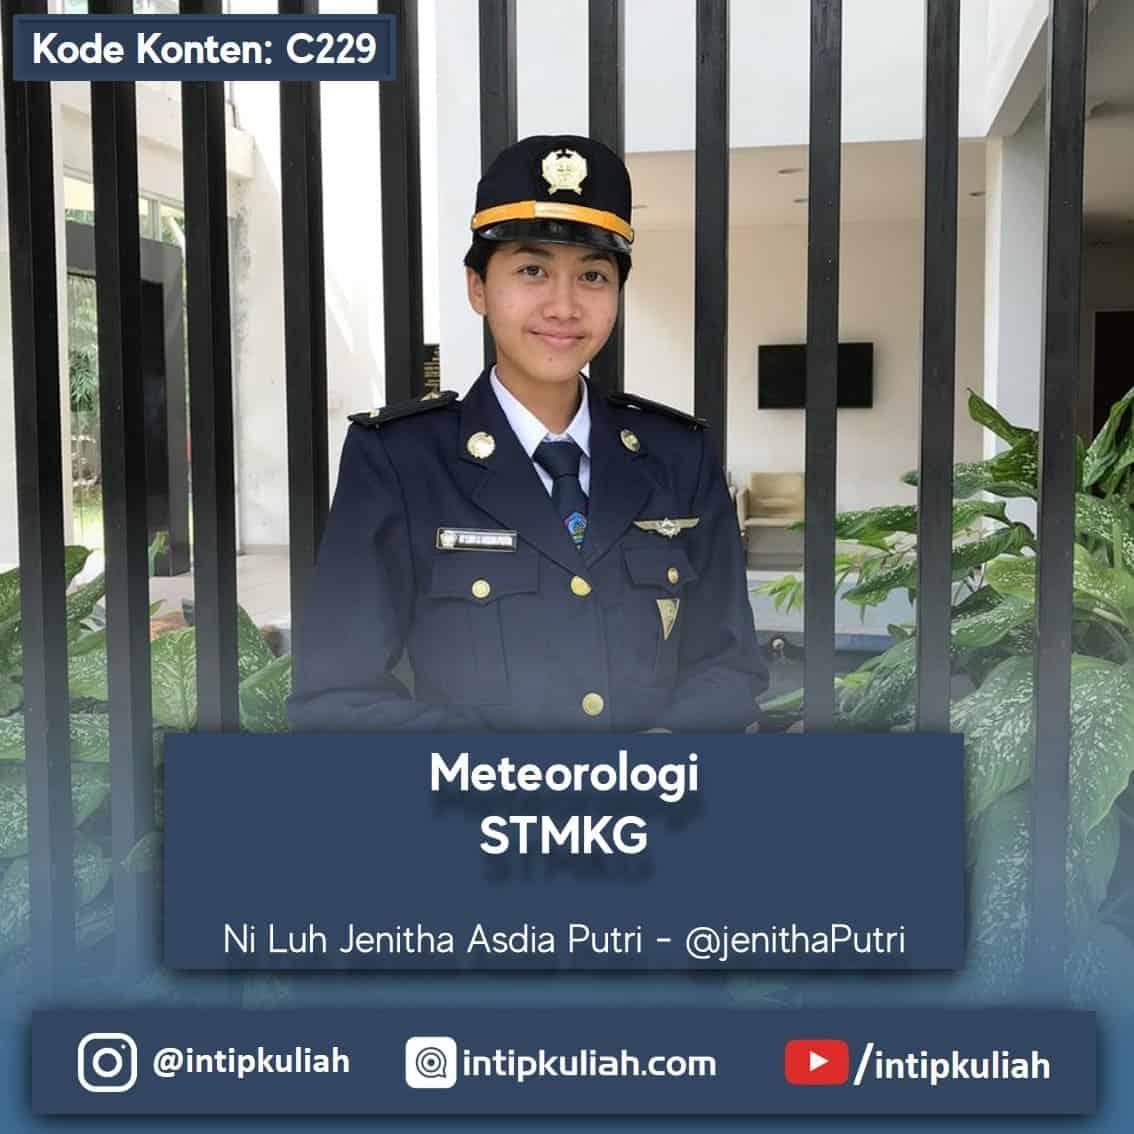 Meteorologi STMKG (Jenitha)